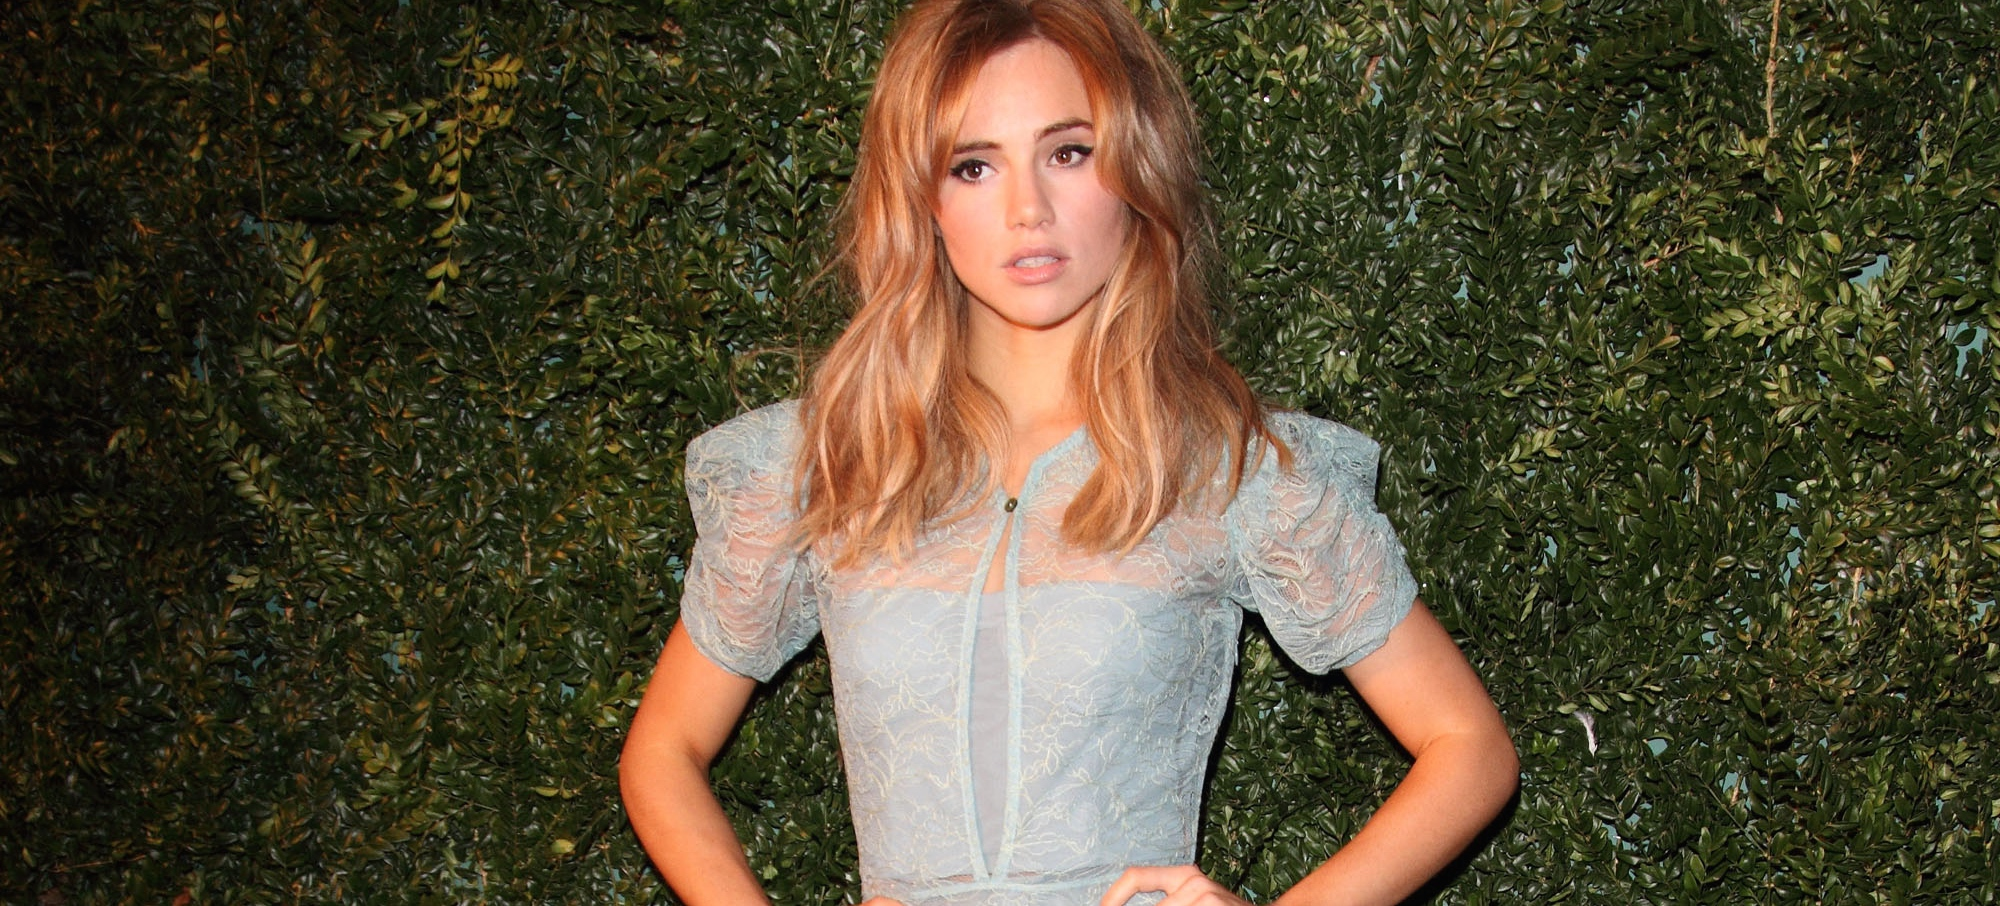 19 of the Most Stylish British 'It' Girls